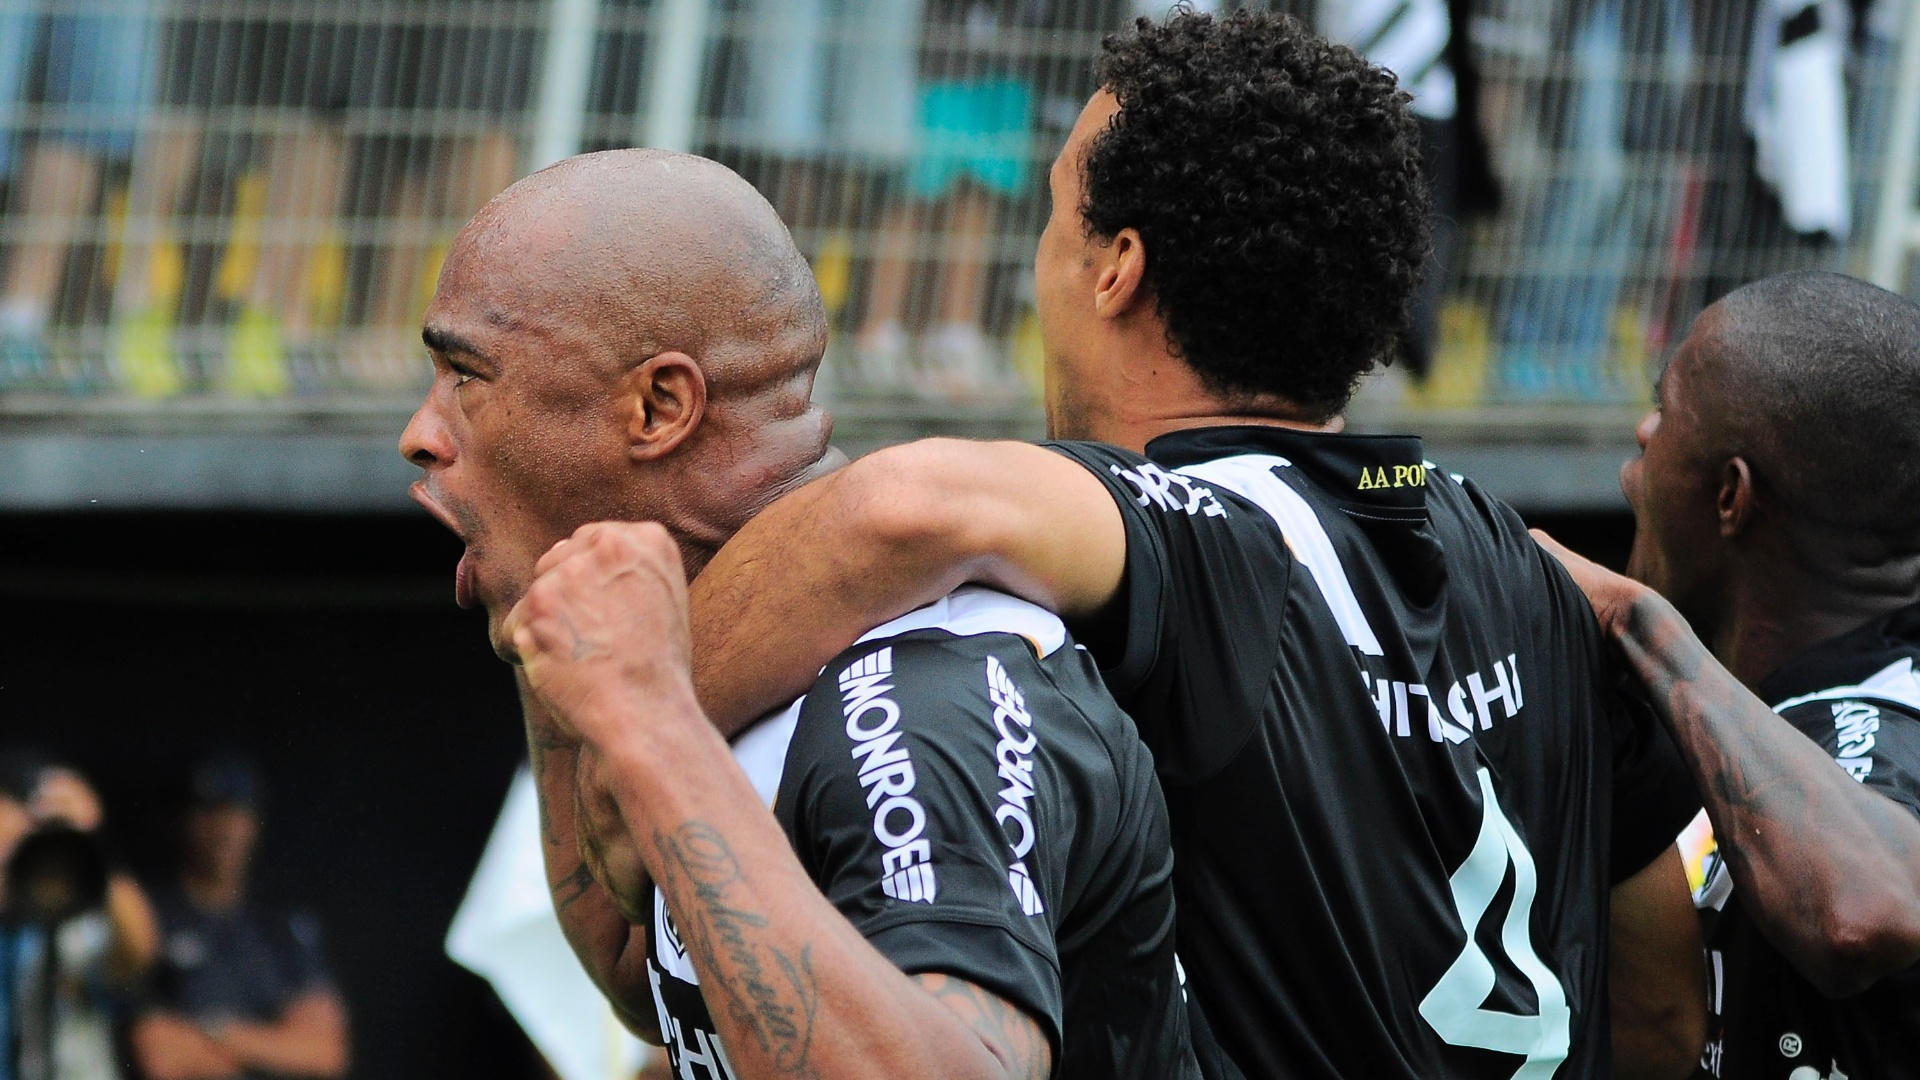 Alexandro comemora primeiro gol da Ponte Preta na partida contra o Bragantino